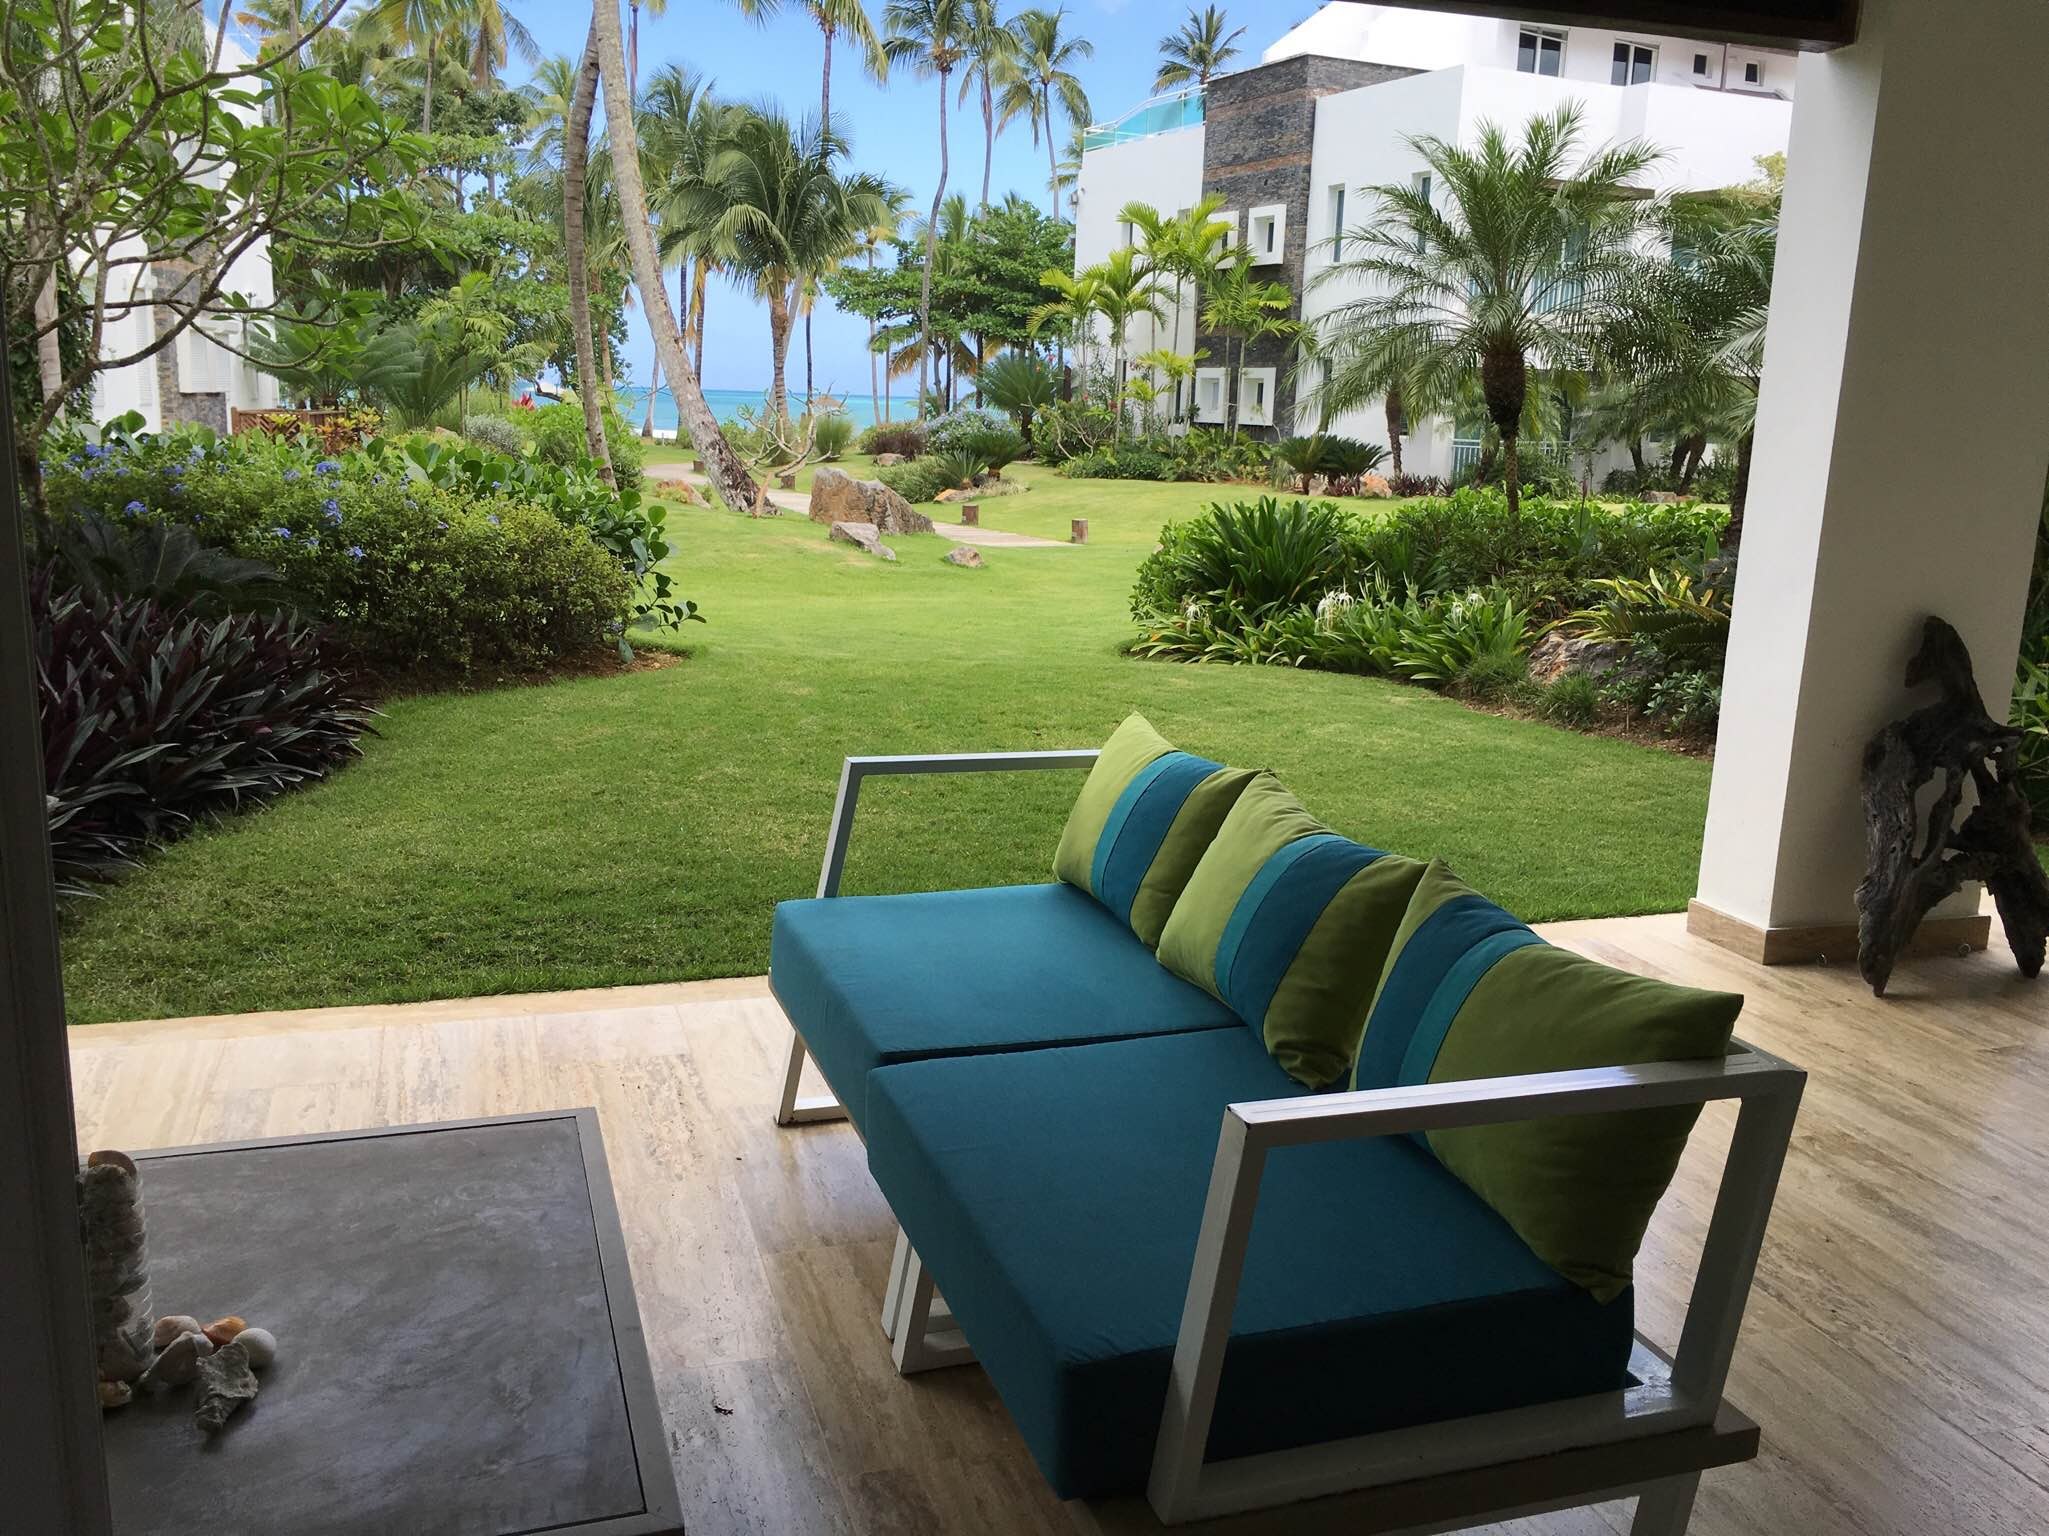 EXCLUSIVE BRAND NEW LISTING : 2 BED 2 BATH BEACH CONDO, PLAYA BONITA - A562LT